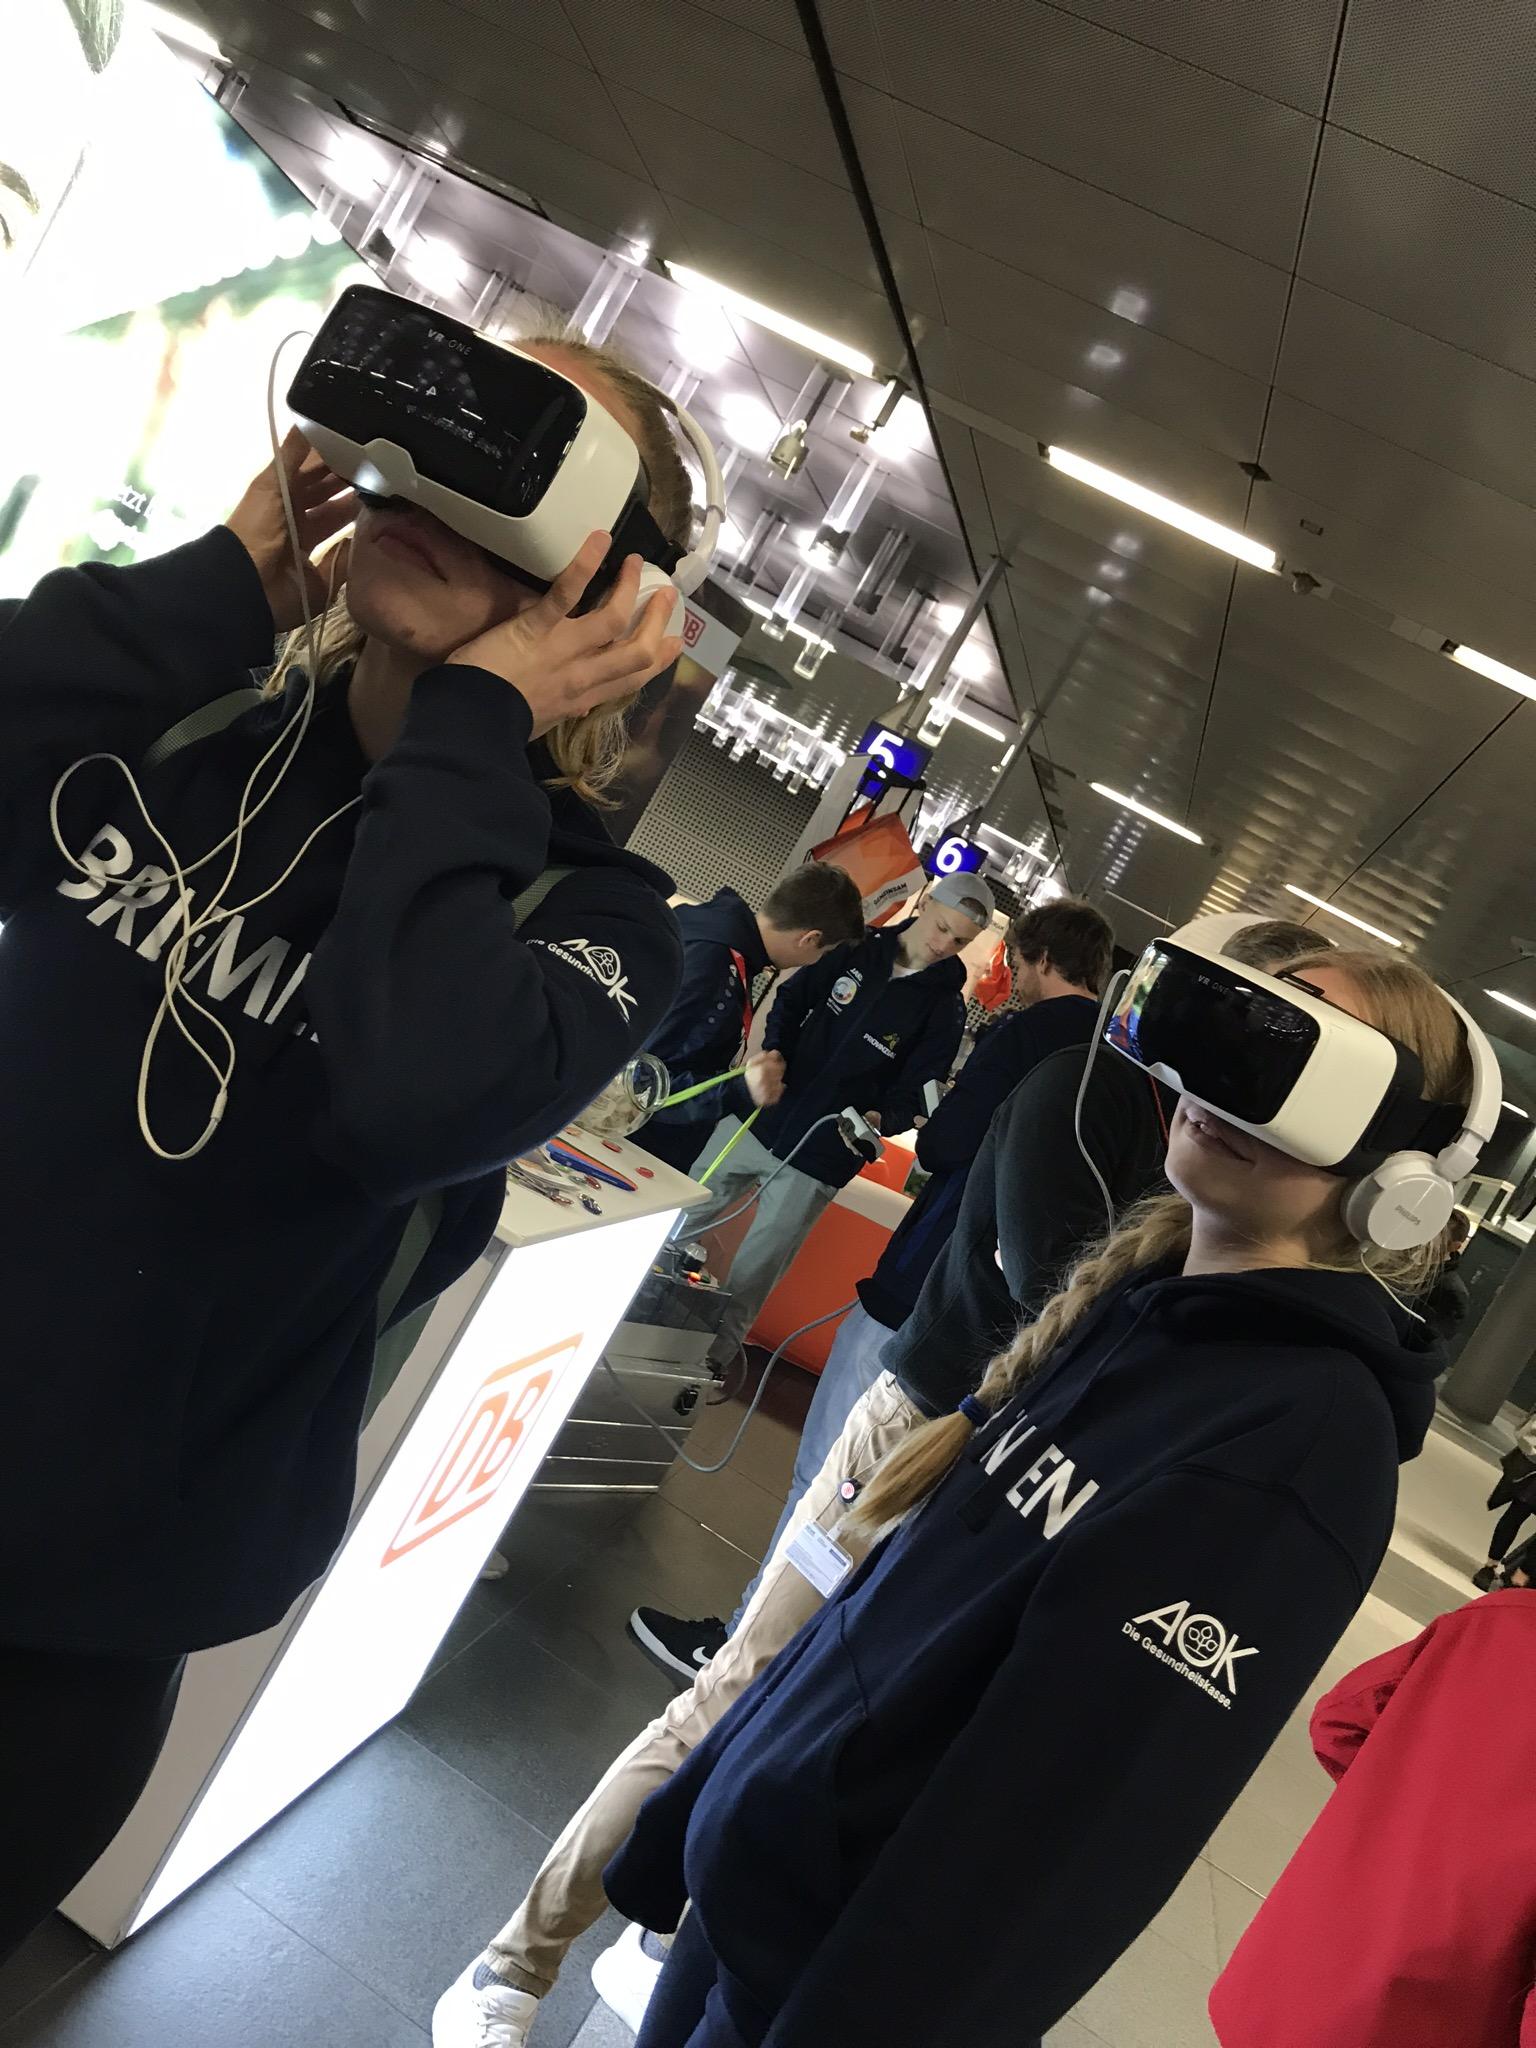 VR am HBF